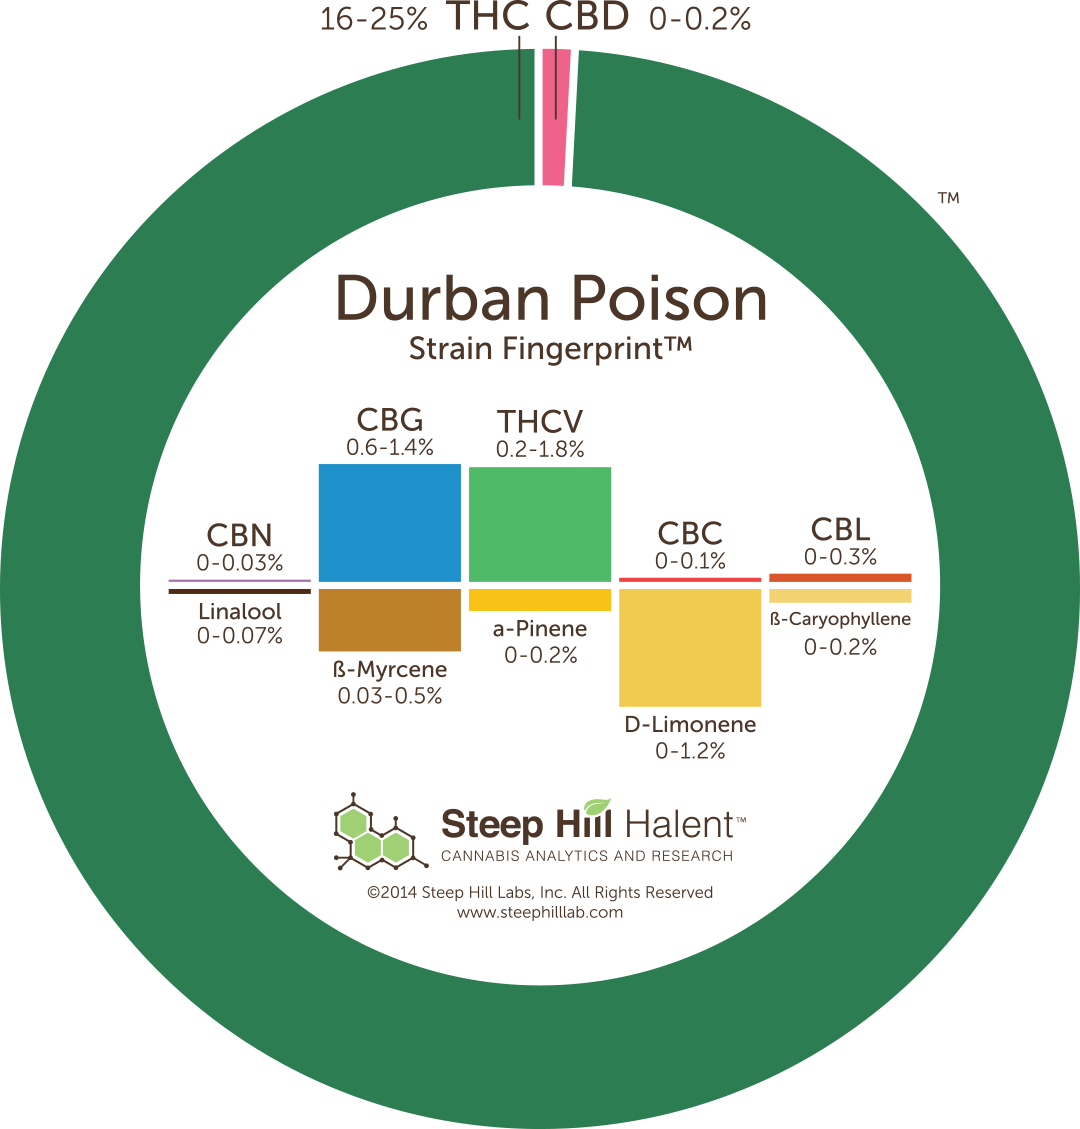 Durban Poison Cannanbinoid Profile